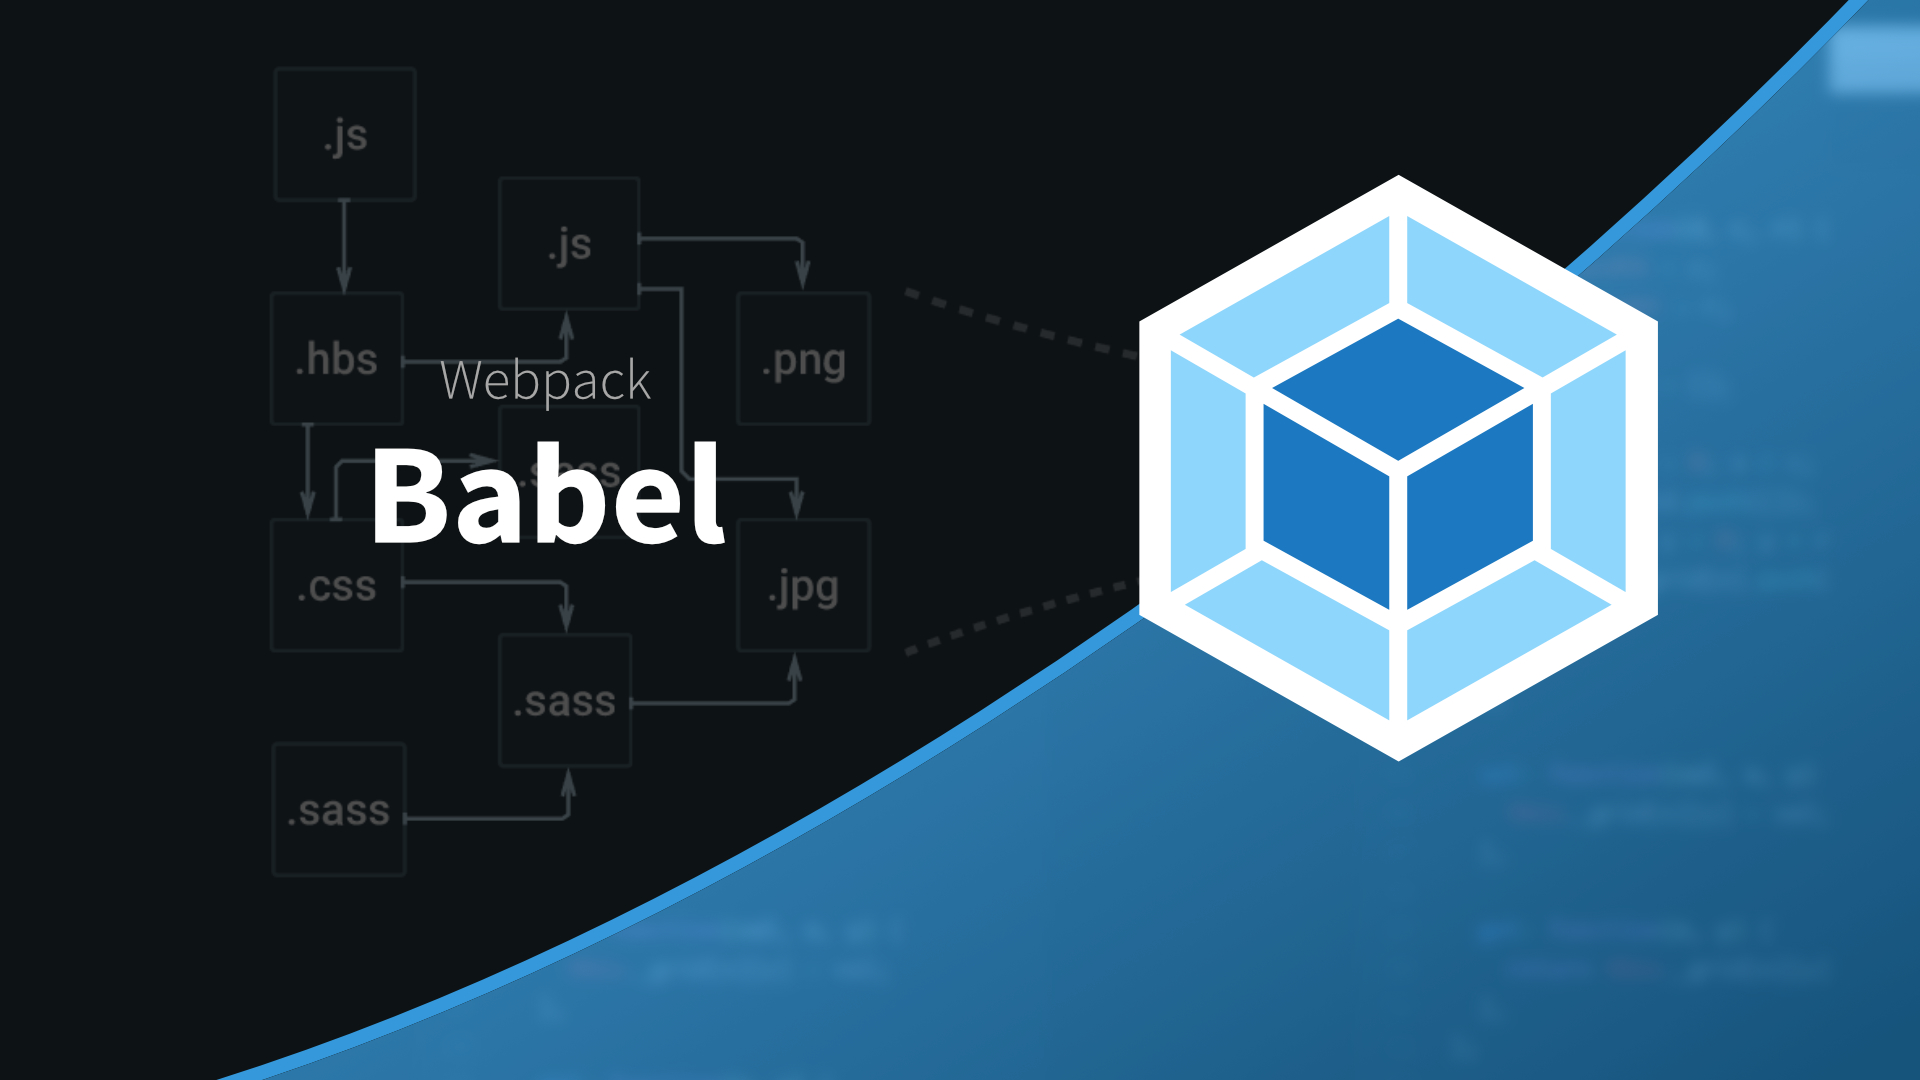 Webpack과 Babel로 최신 JavaScript 웹프론트 개발환경 만들기